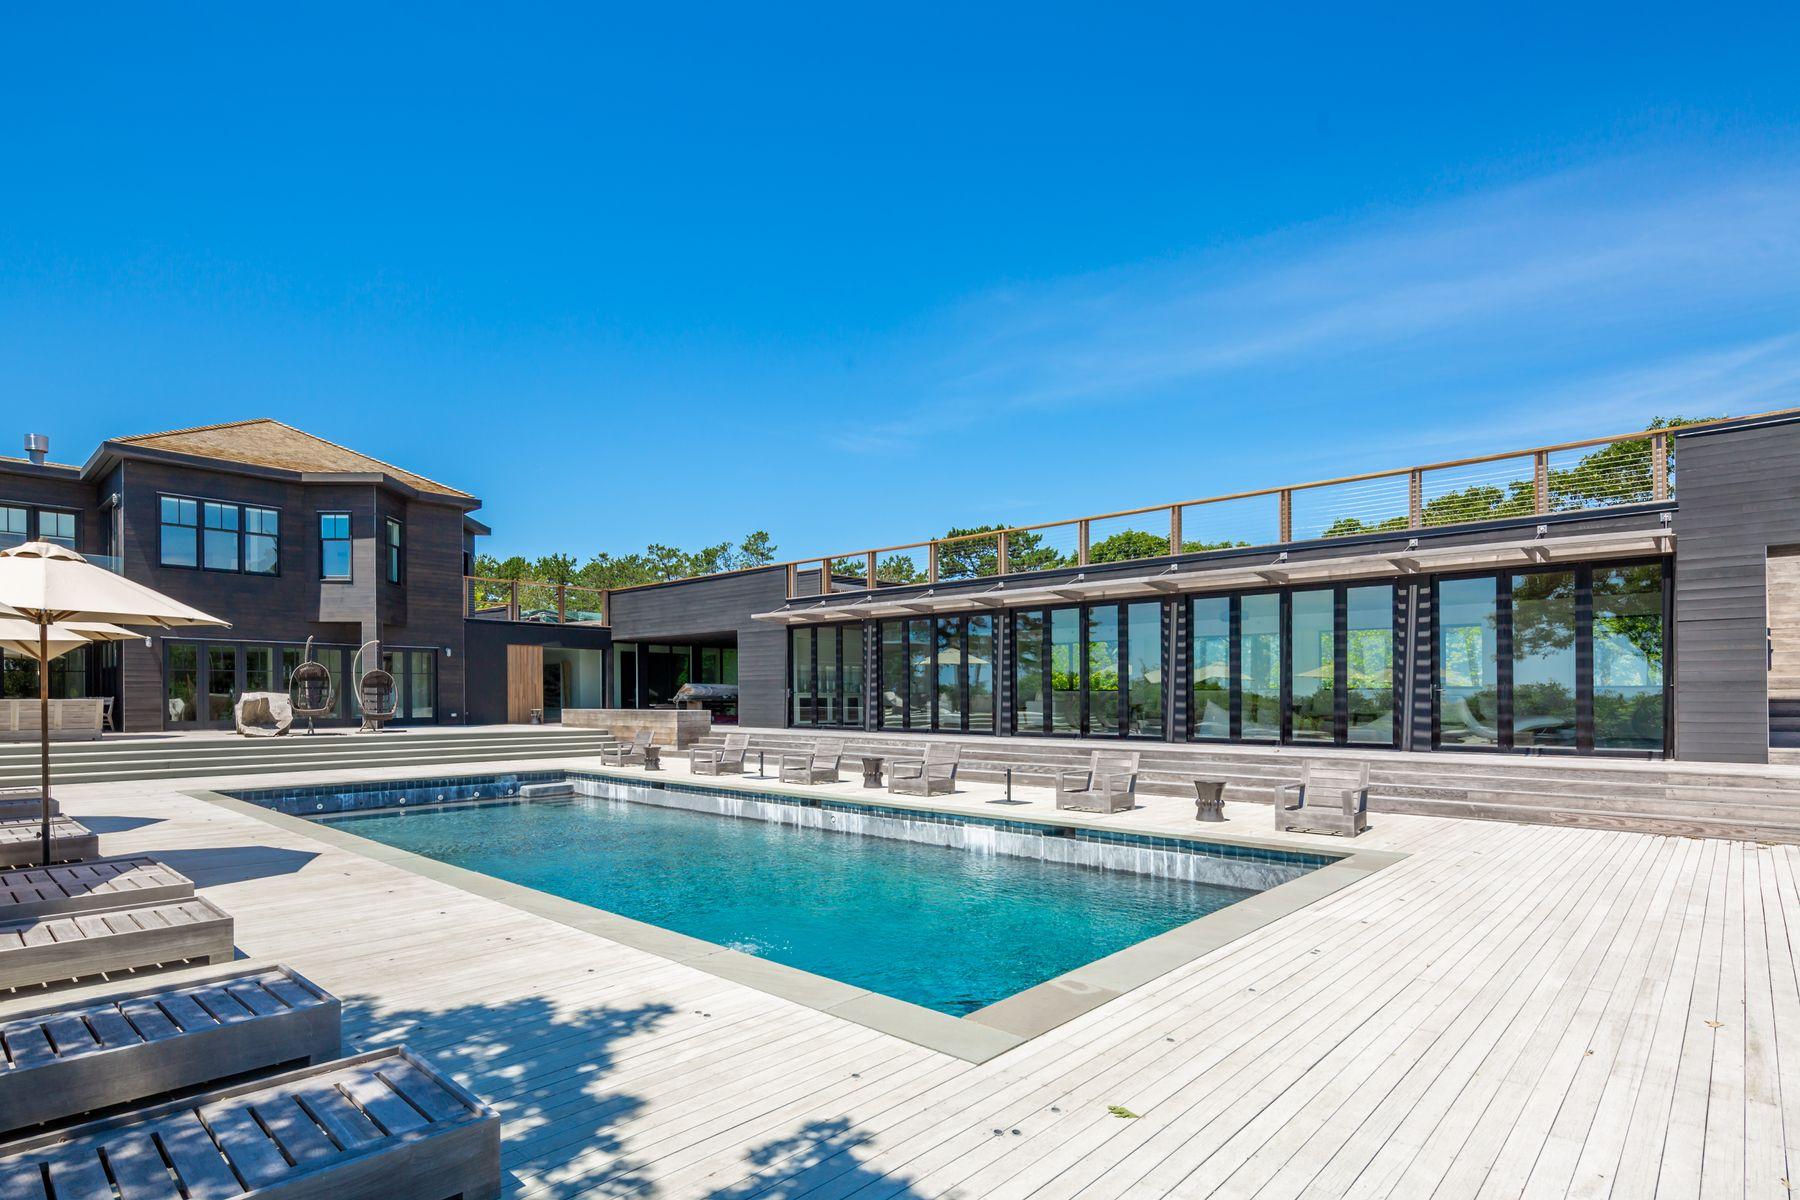 res4-resolution-4-architecture-modern-modular-house-prefab-amagansett-addition-exterior-lounge-pool-deck-trellis-shade.jpg